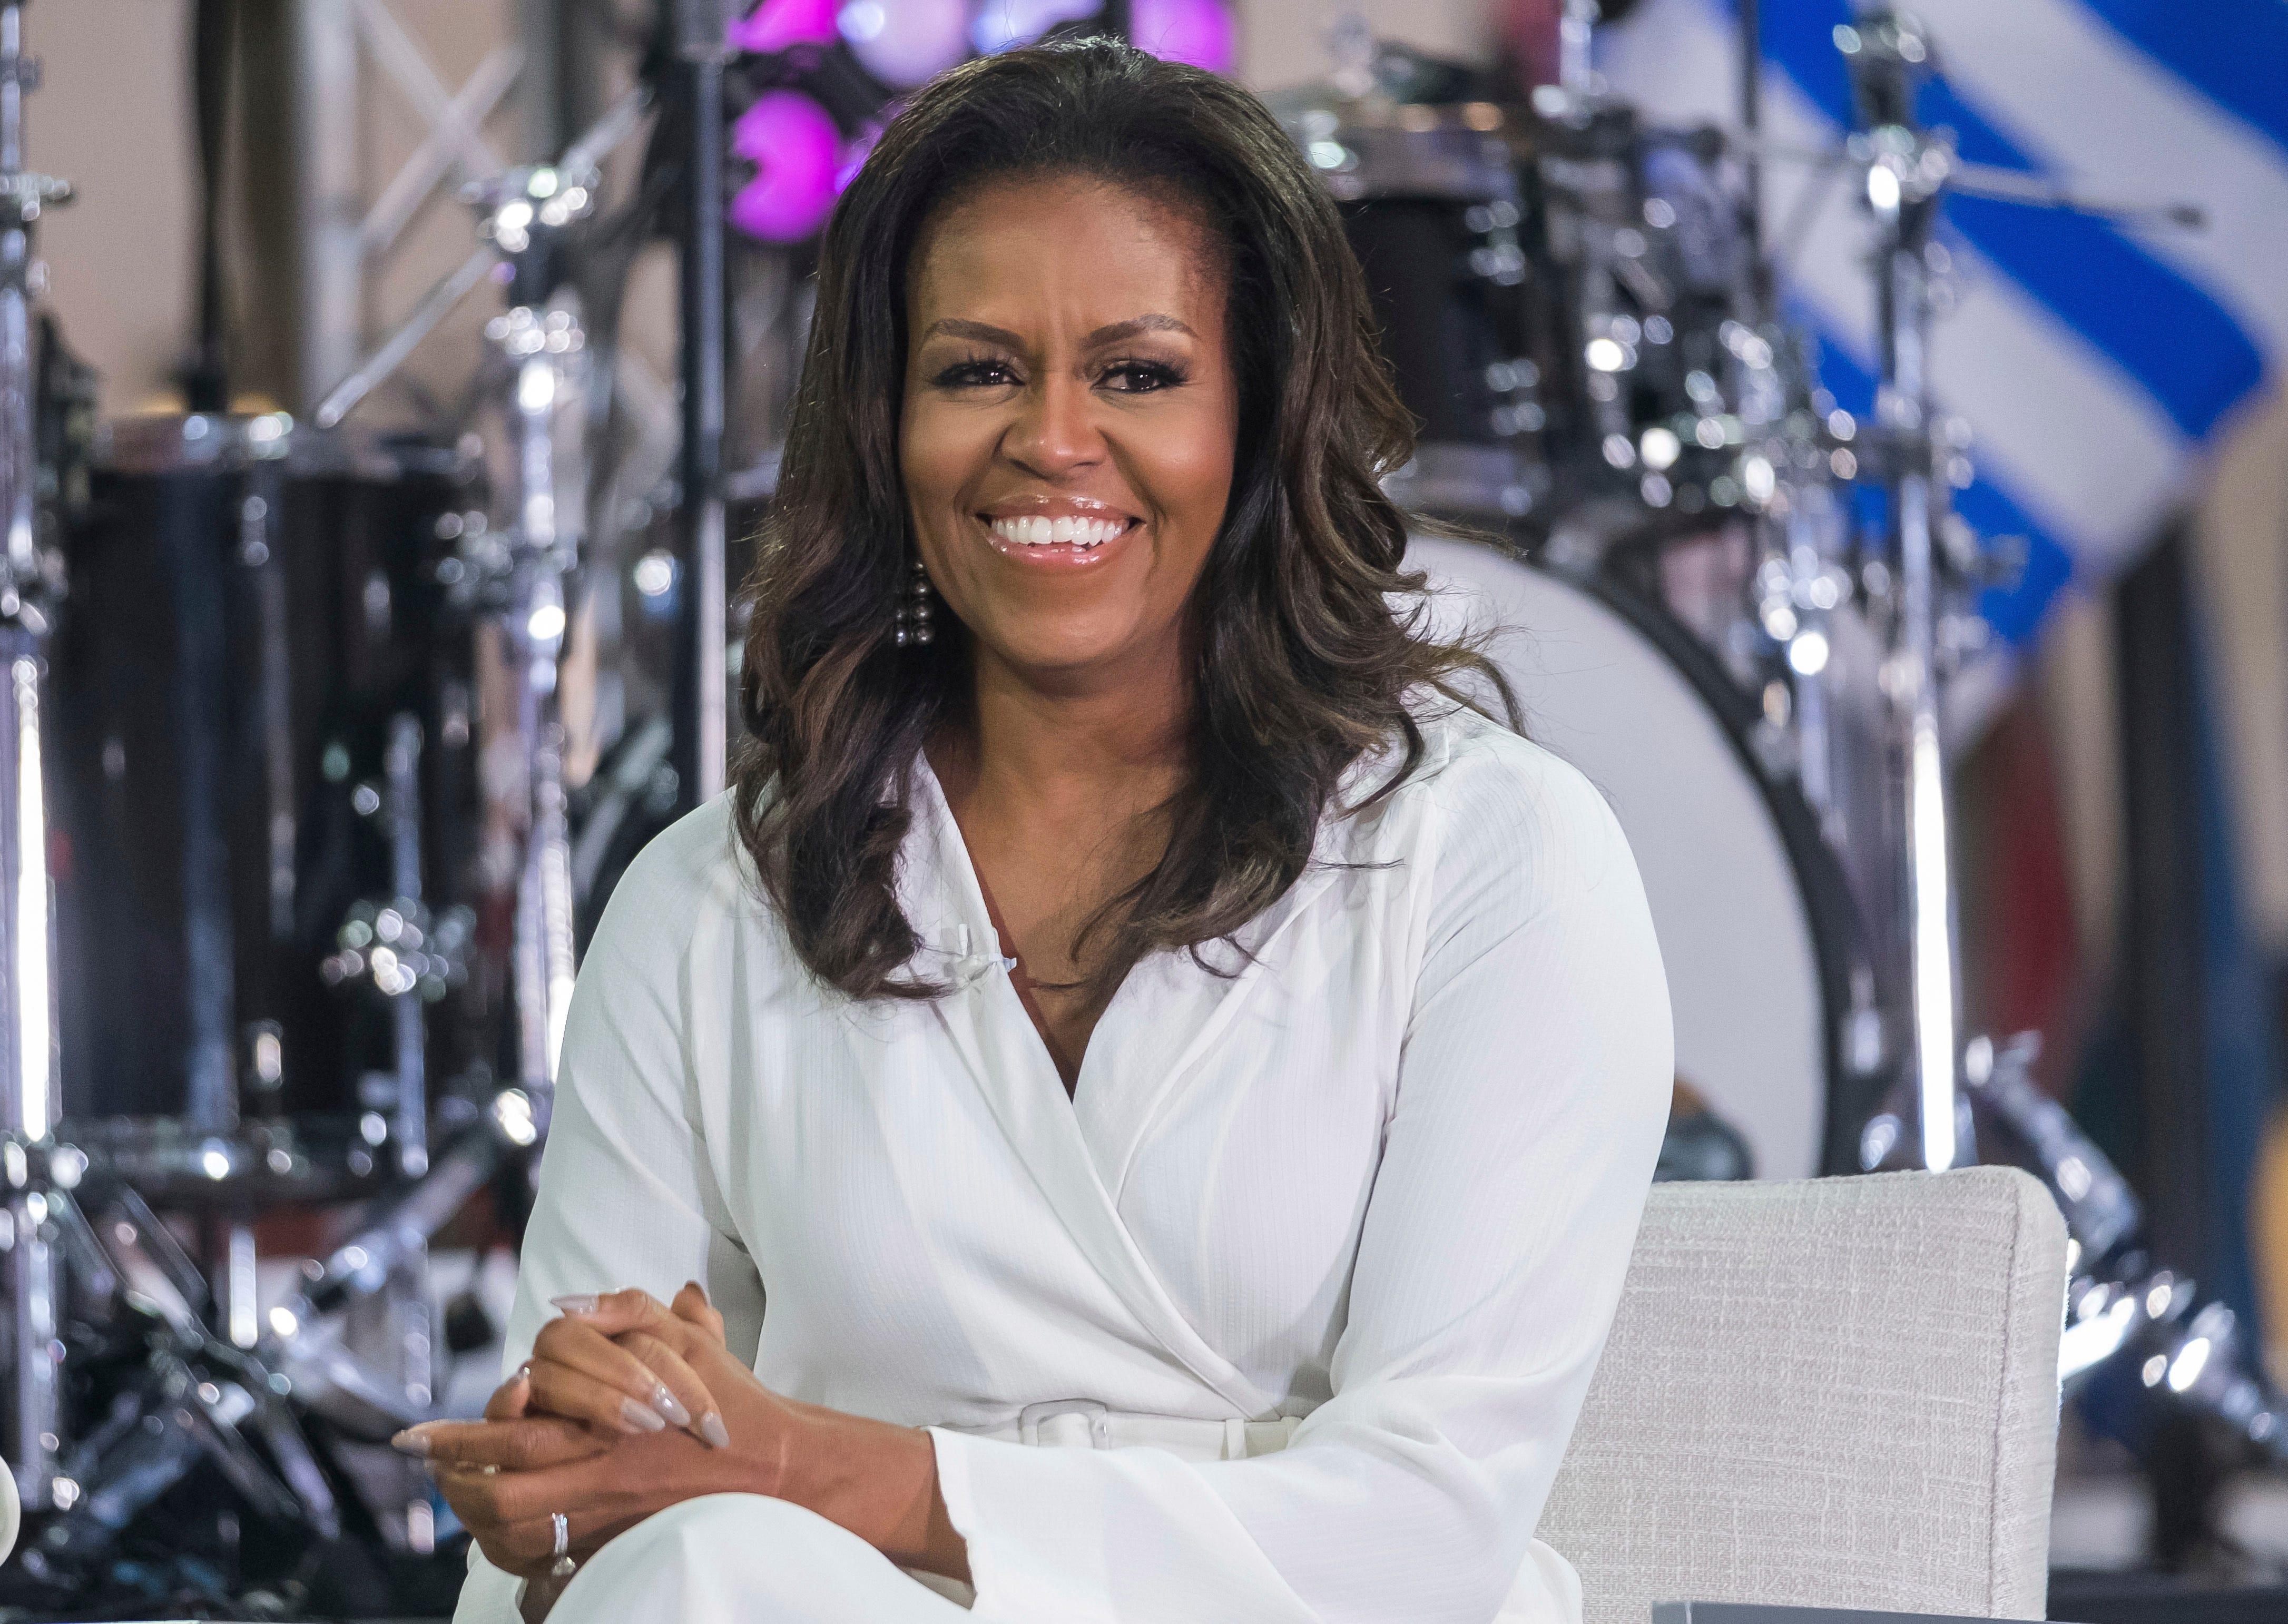 Michelle Obama reveals she struggled to conceive, used IVF to have Malia and Sasha